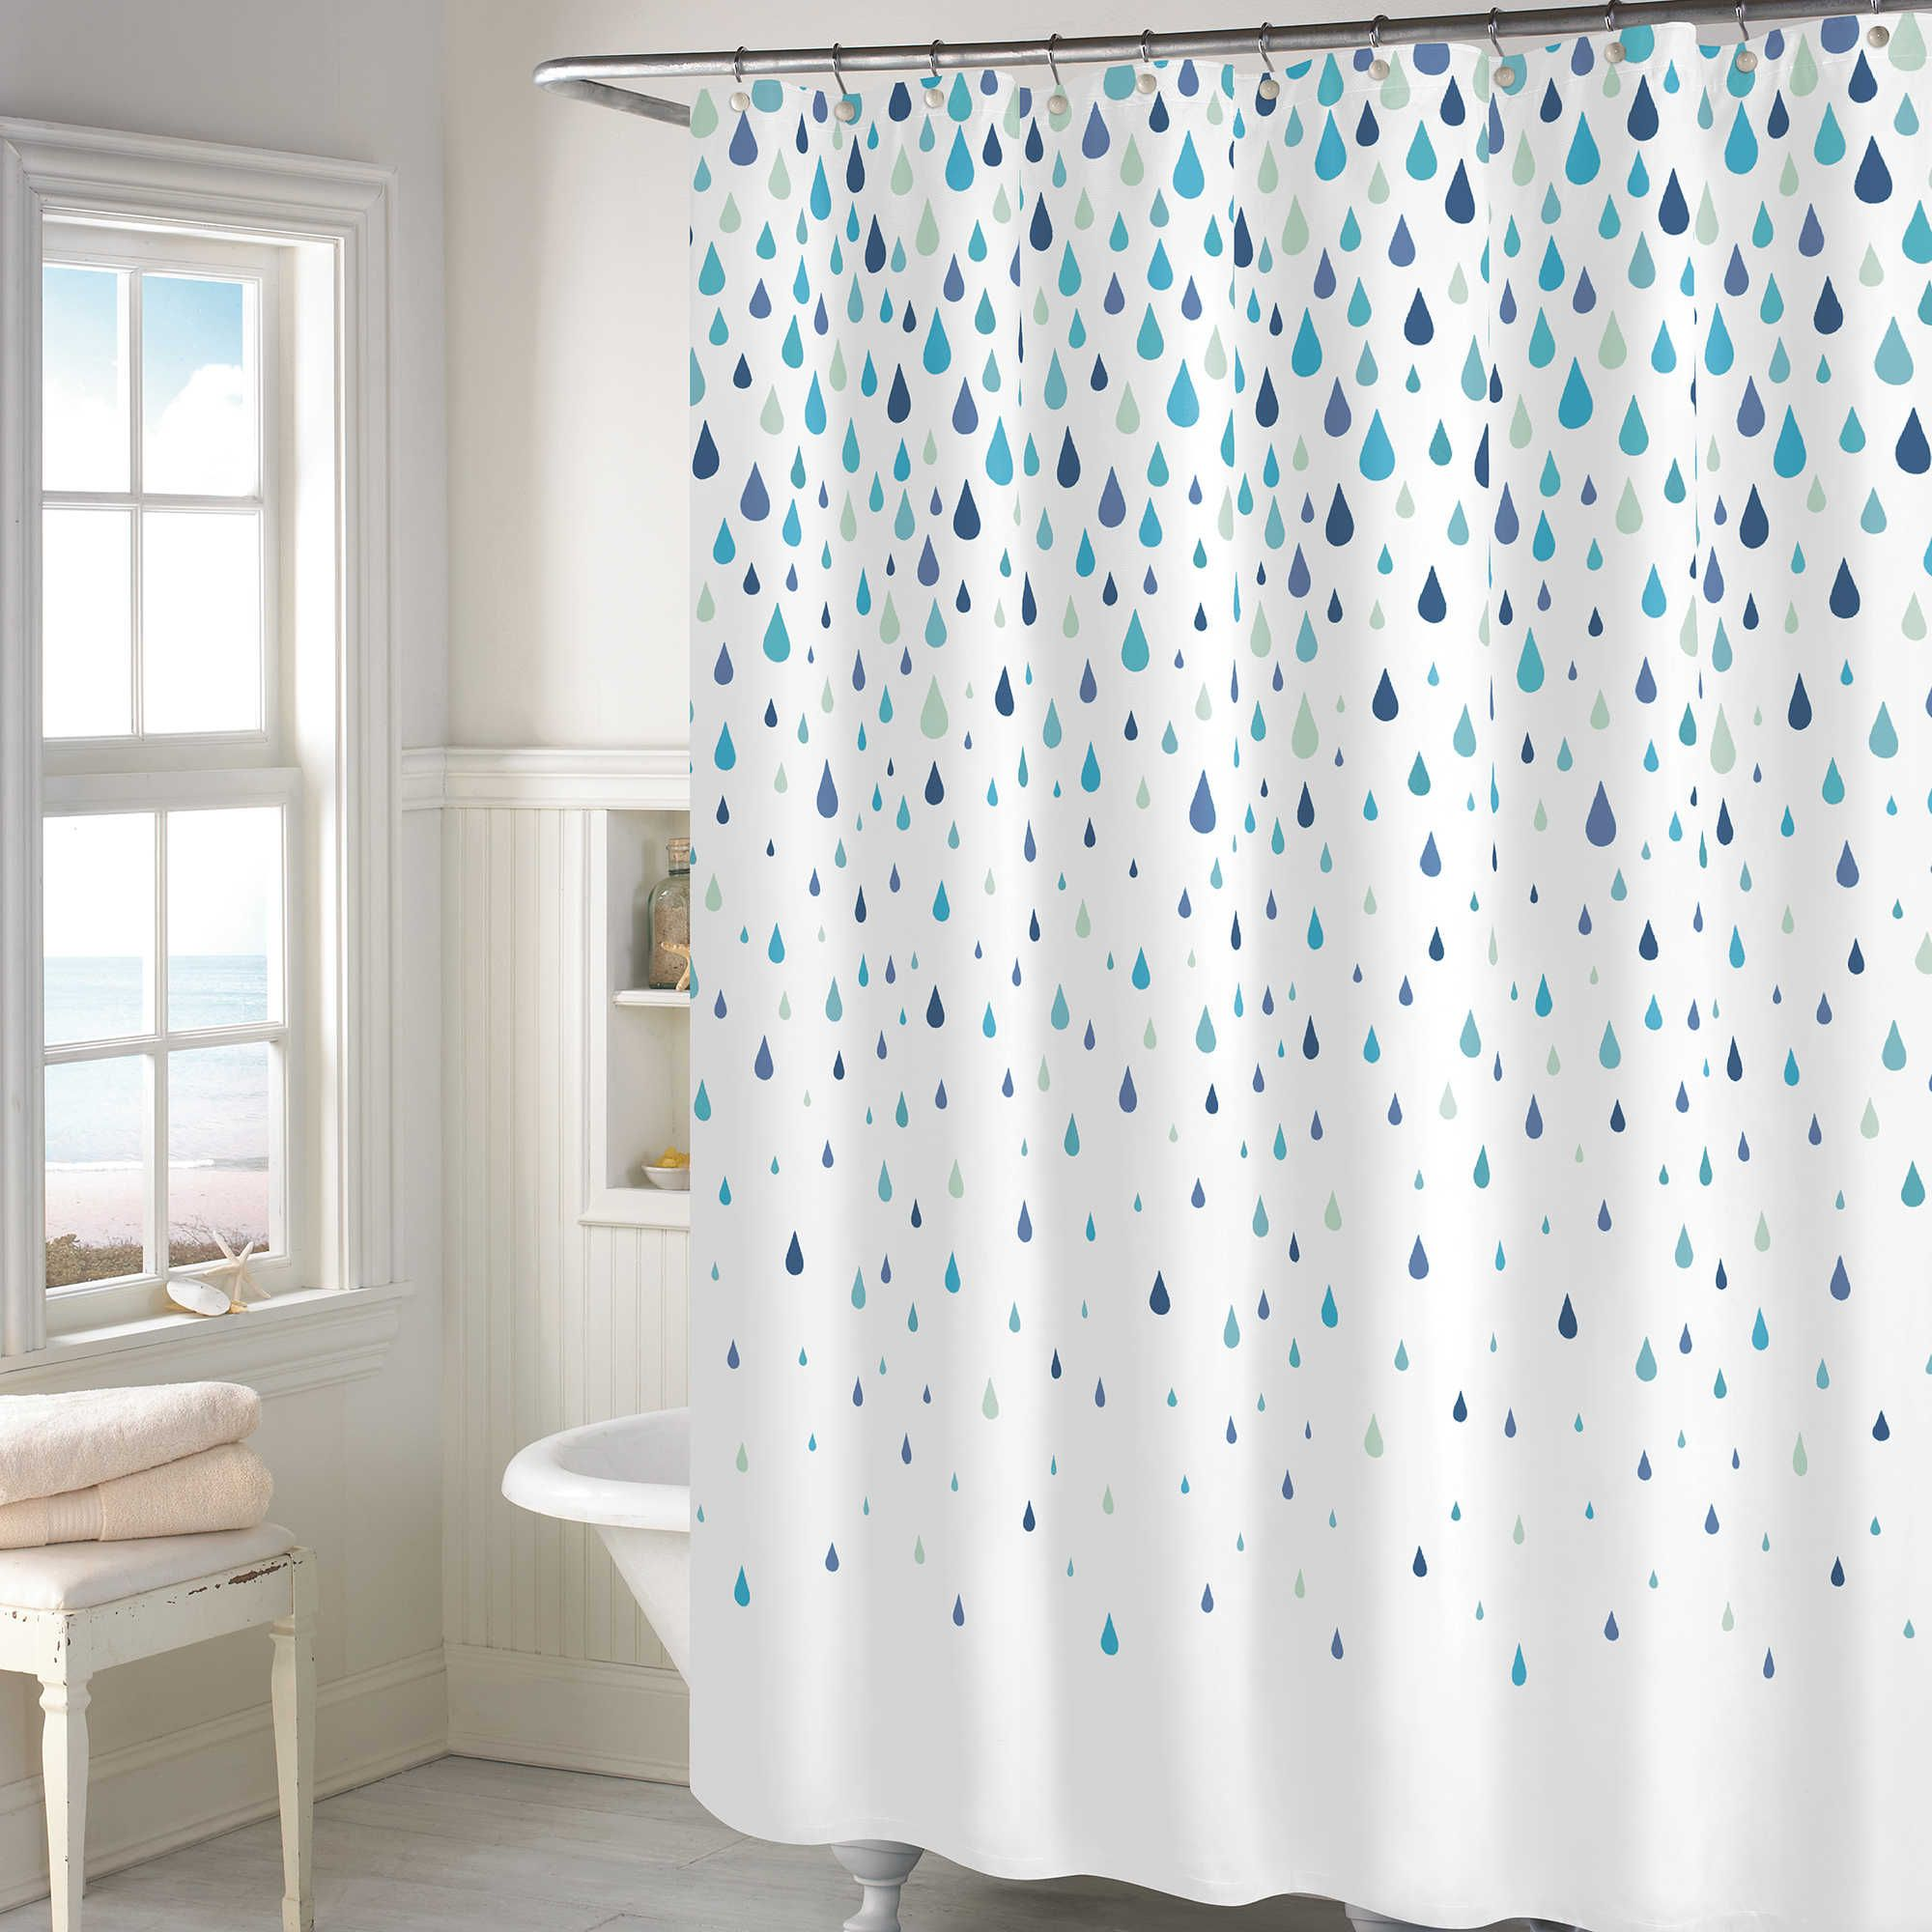 Rainy Days Shower Curtain In Aqua Shower Bathroom Cost Aqua